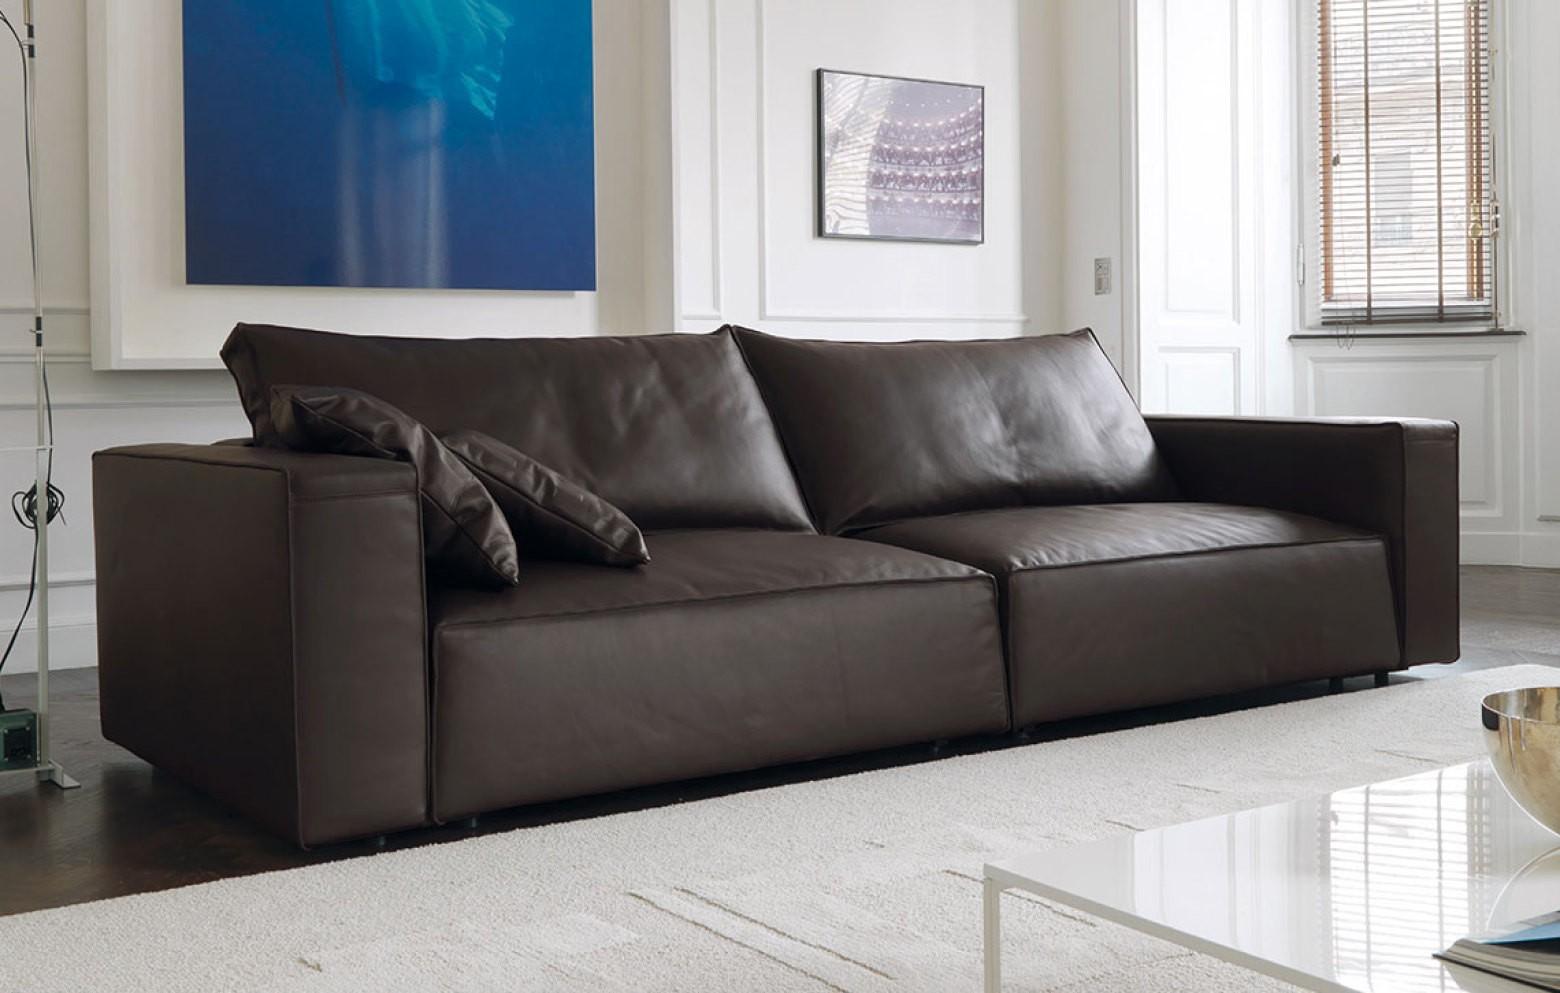 zenit einzelsofas polsterm bel who 39 s perfect. Black Bedroom Furniture Sets. Home Design Ideas